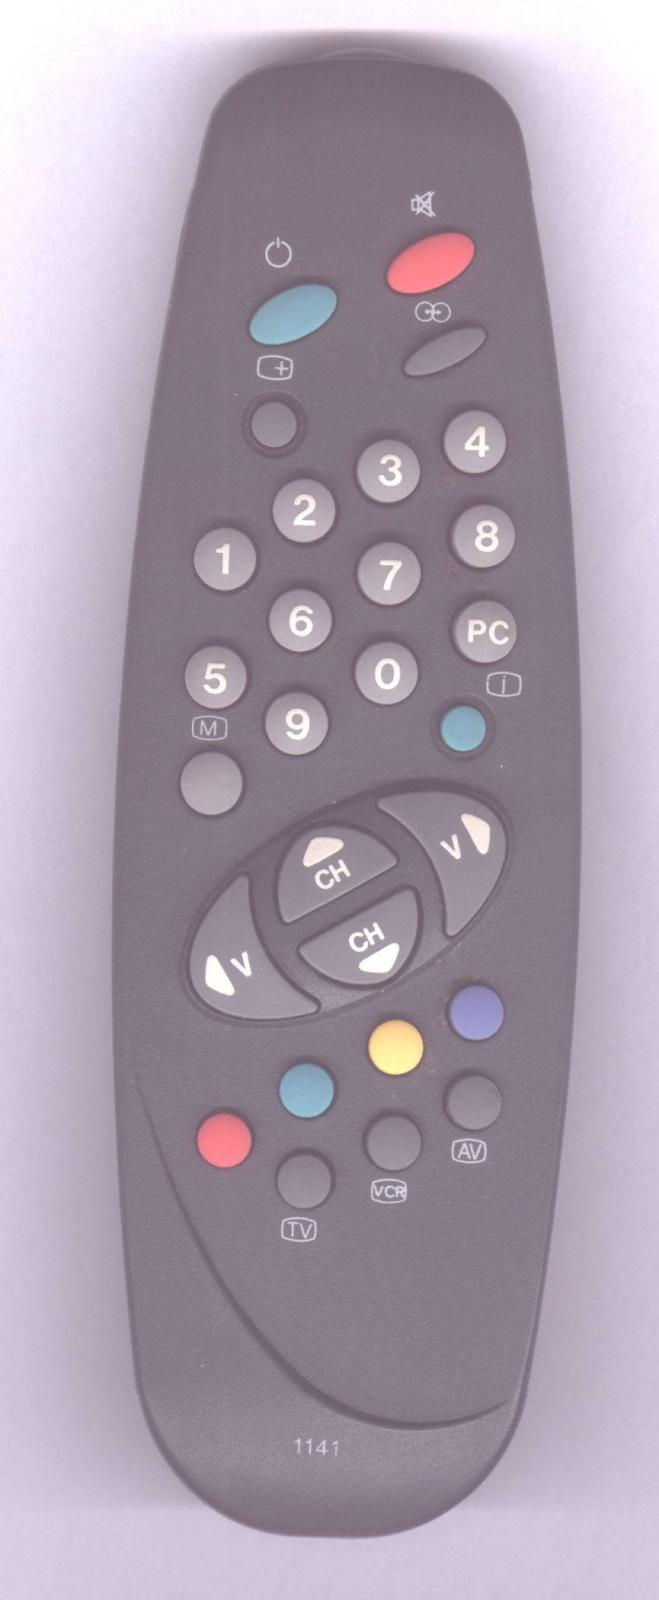 BLUEsky BSL-28S (CHASIS 11AK19-5) control remoto 1141